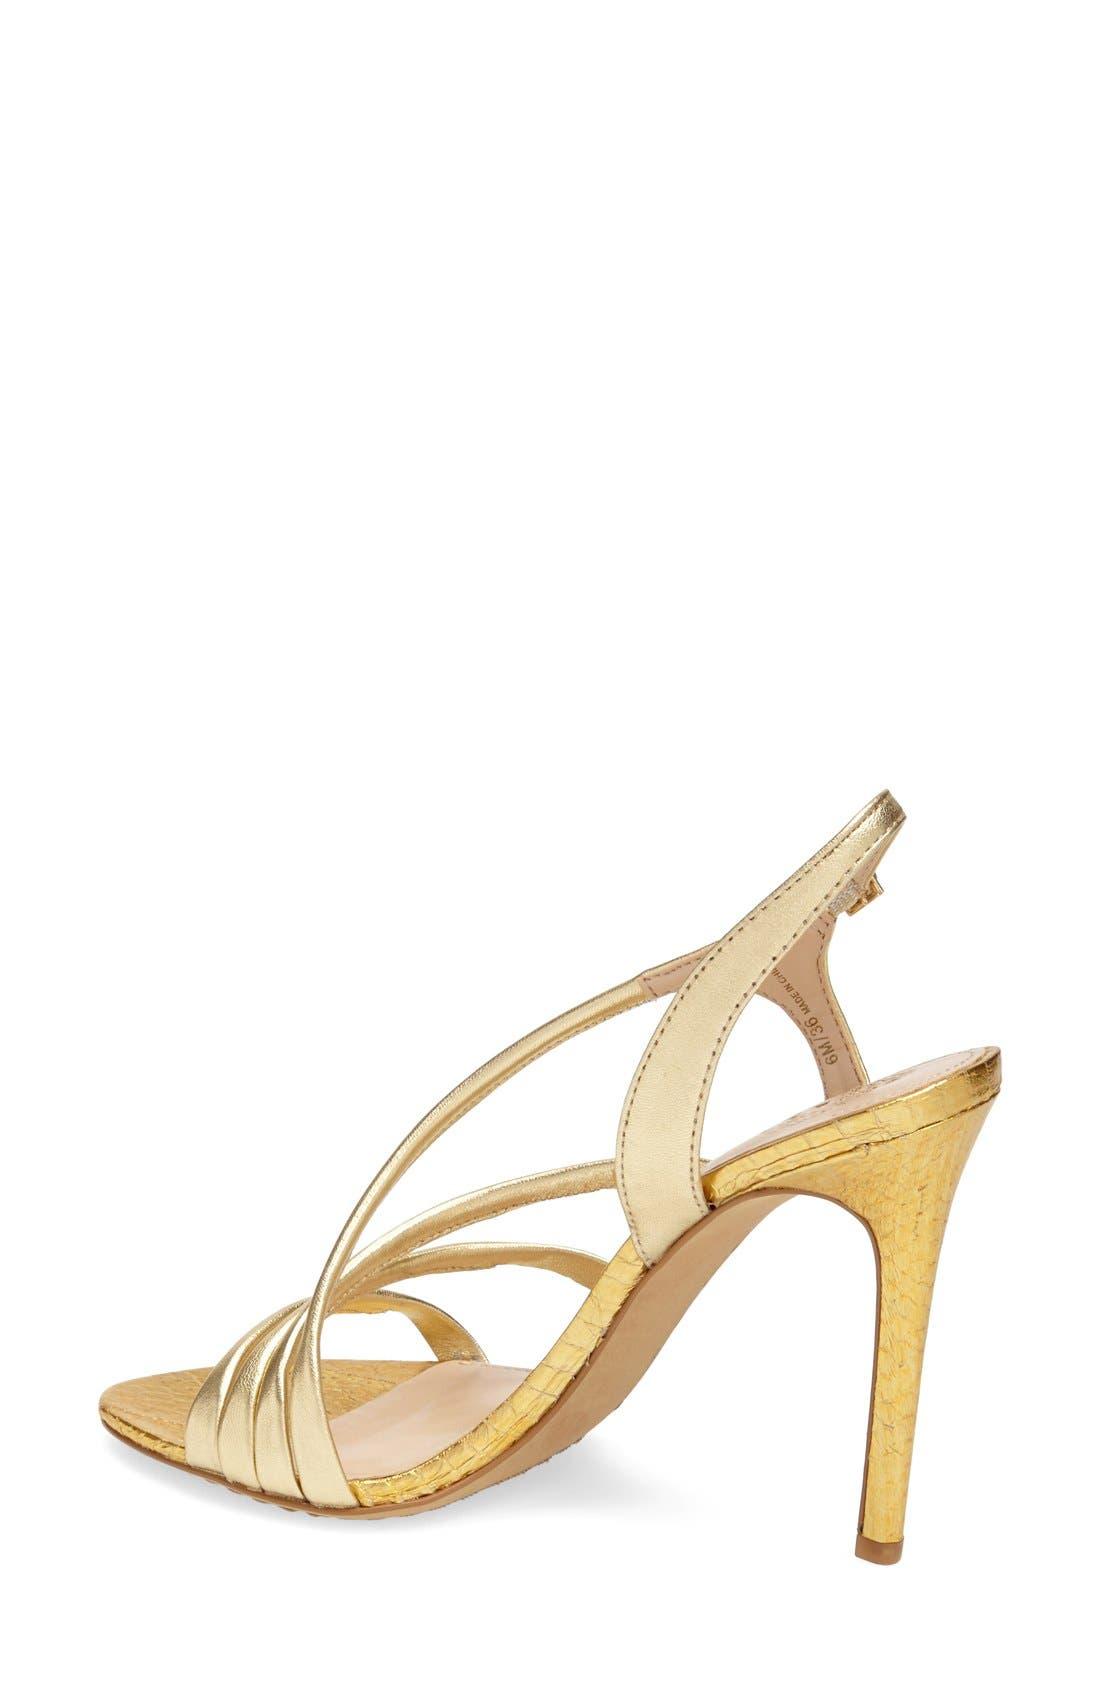 'Tiernan' Strappy Leather Sandal,                             Alternate thumbnail 2, color,                             Gold